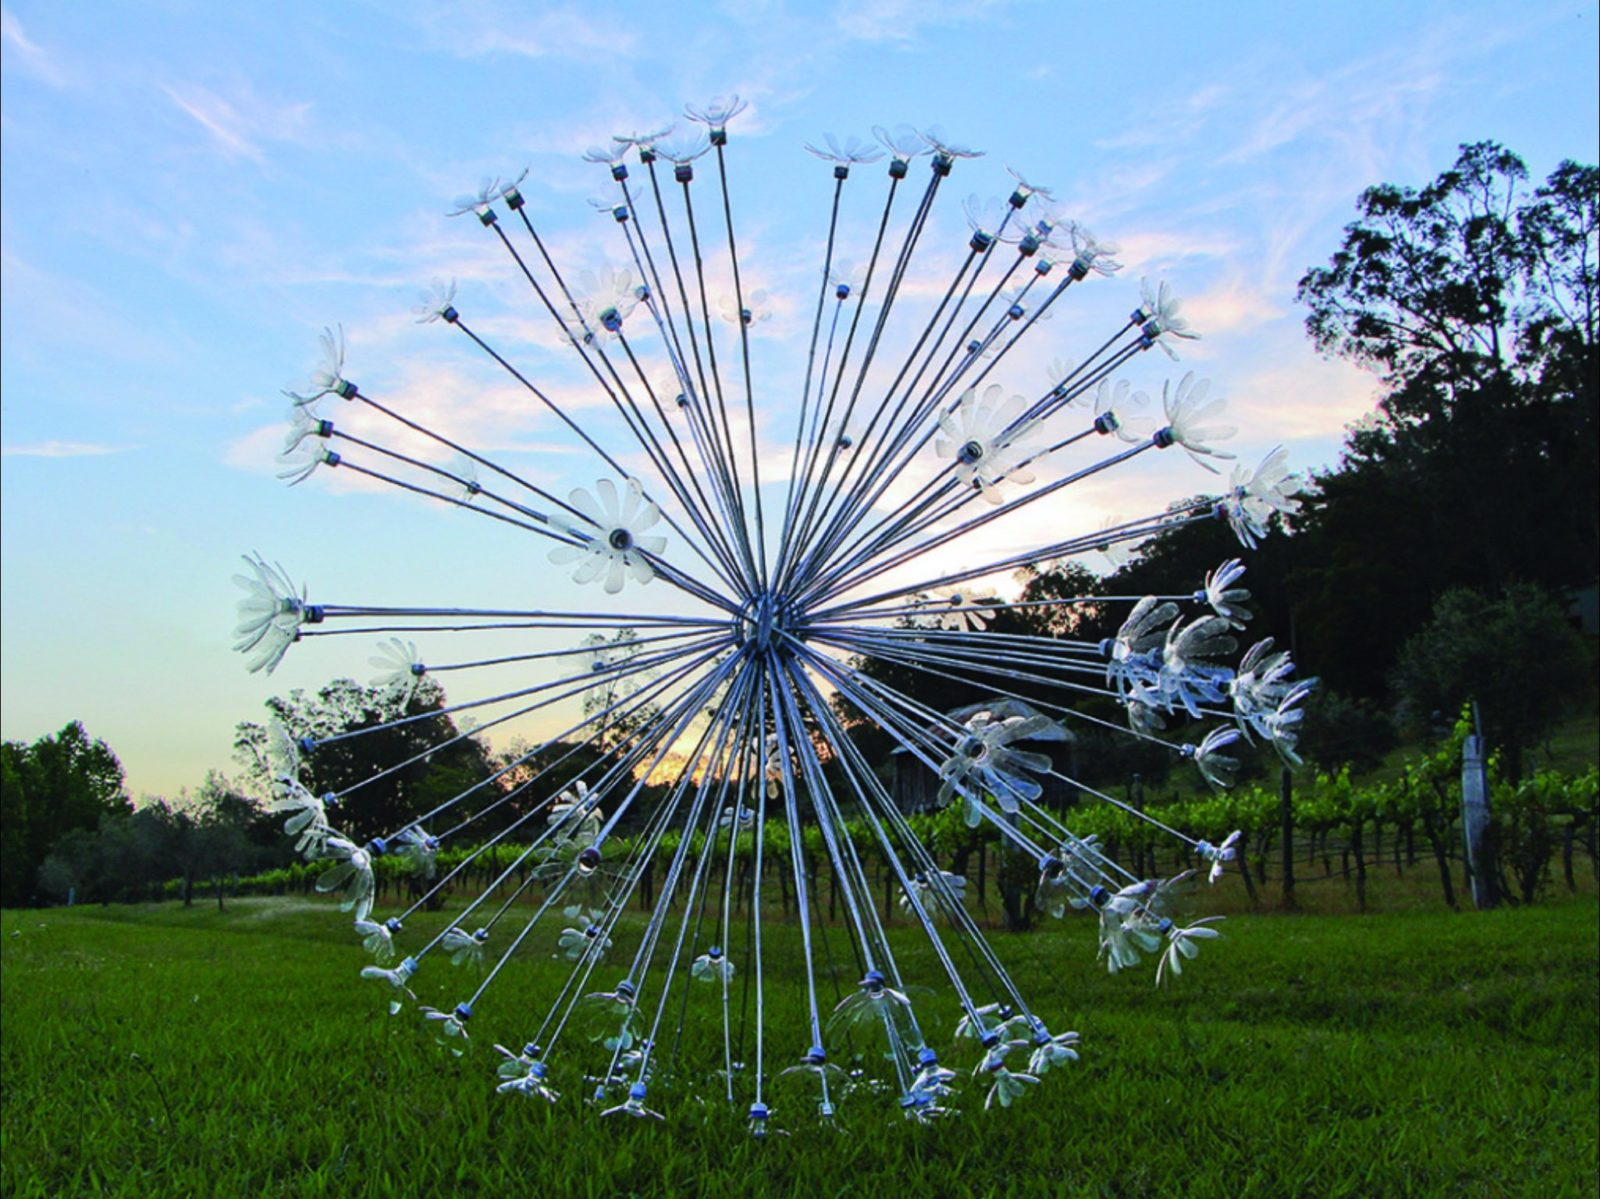 Fountain of Zero Brenner and Muljana_in vines sky